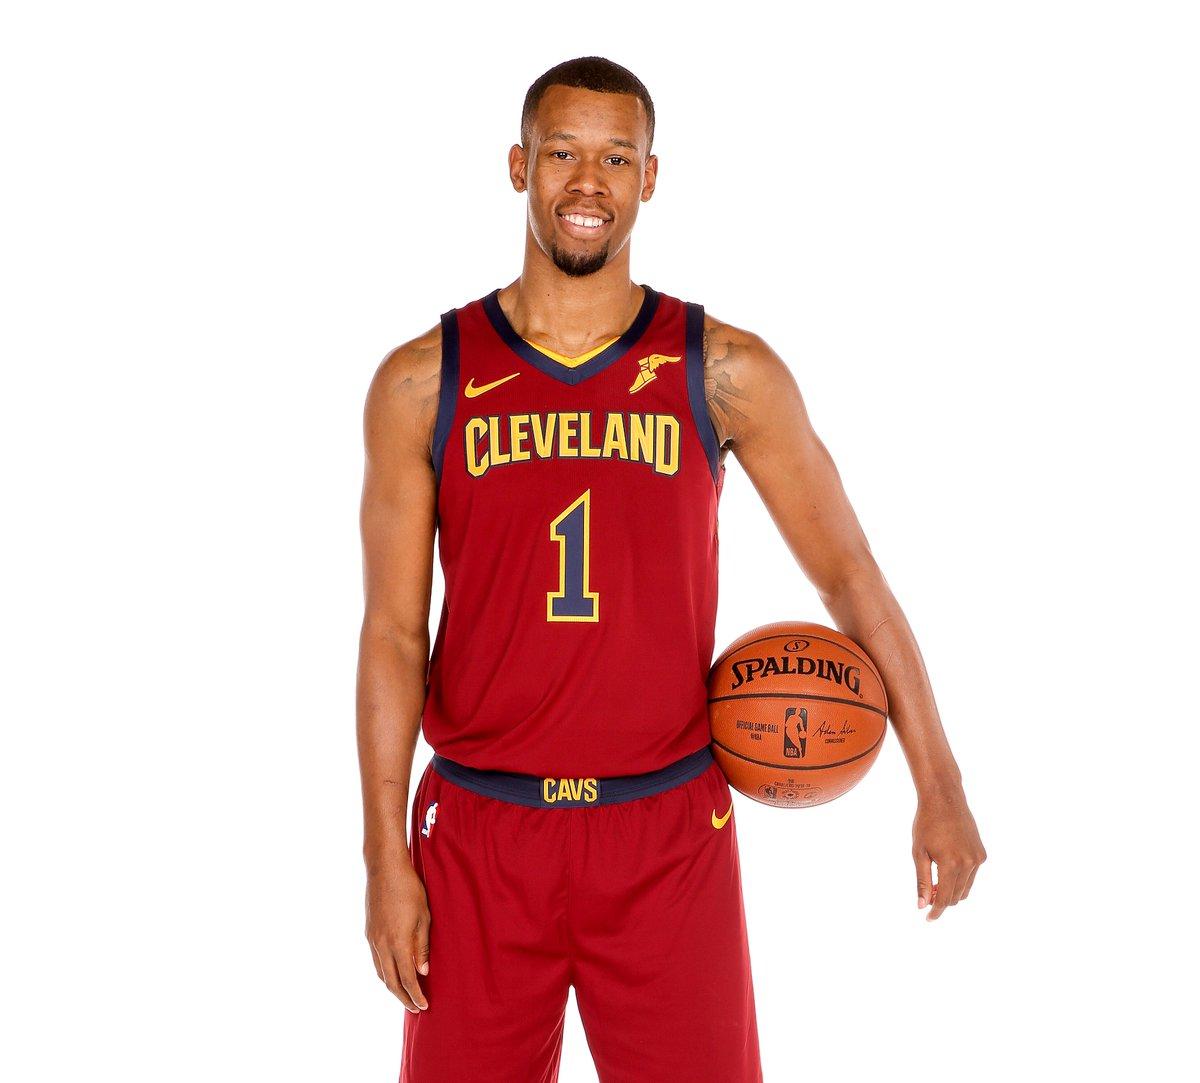 RT @NBA: Join us in wishing Rodney Hood of the @cavs a HAPPY 26th BIRTHDAY! #NBABDAY https://t.co/0ZuDWARJcc